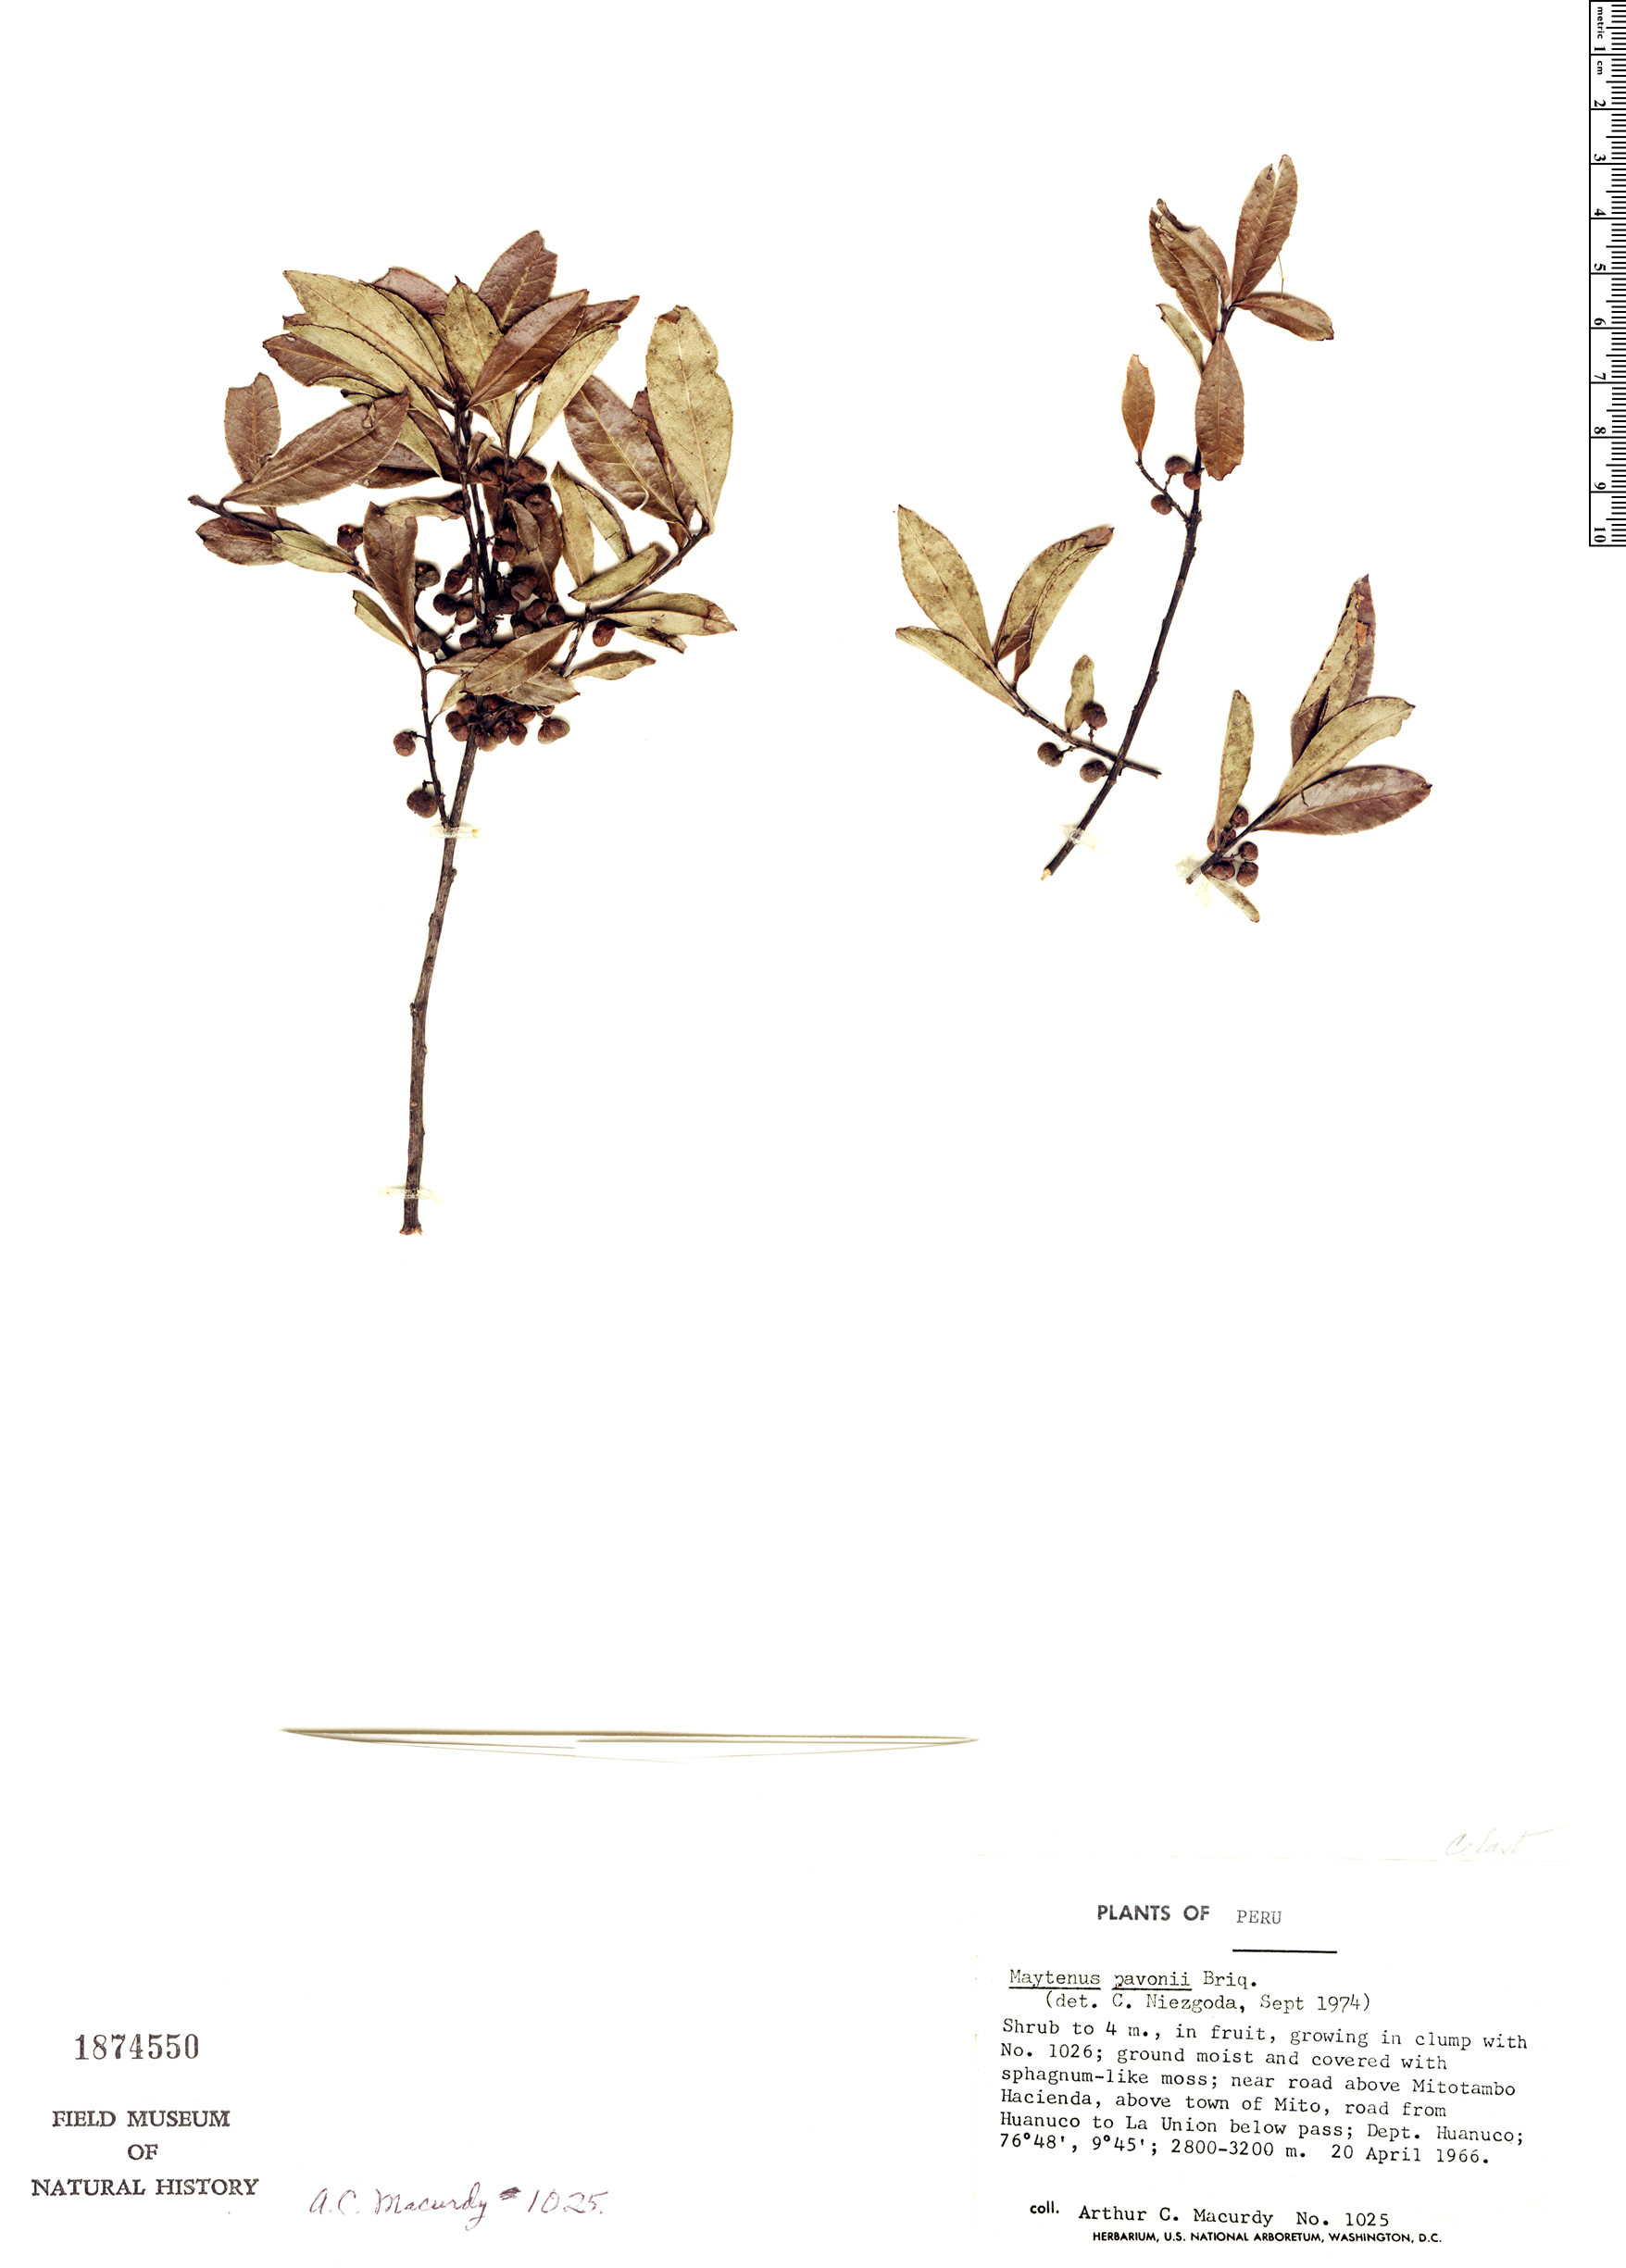 Specimen: Maytenus pavonii